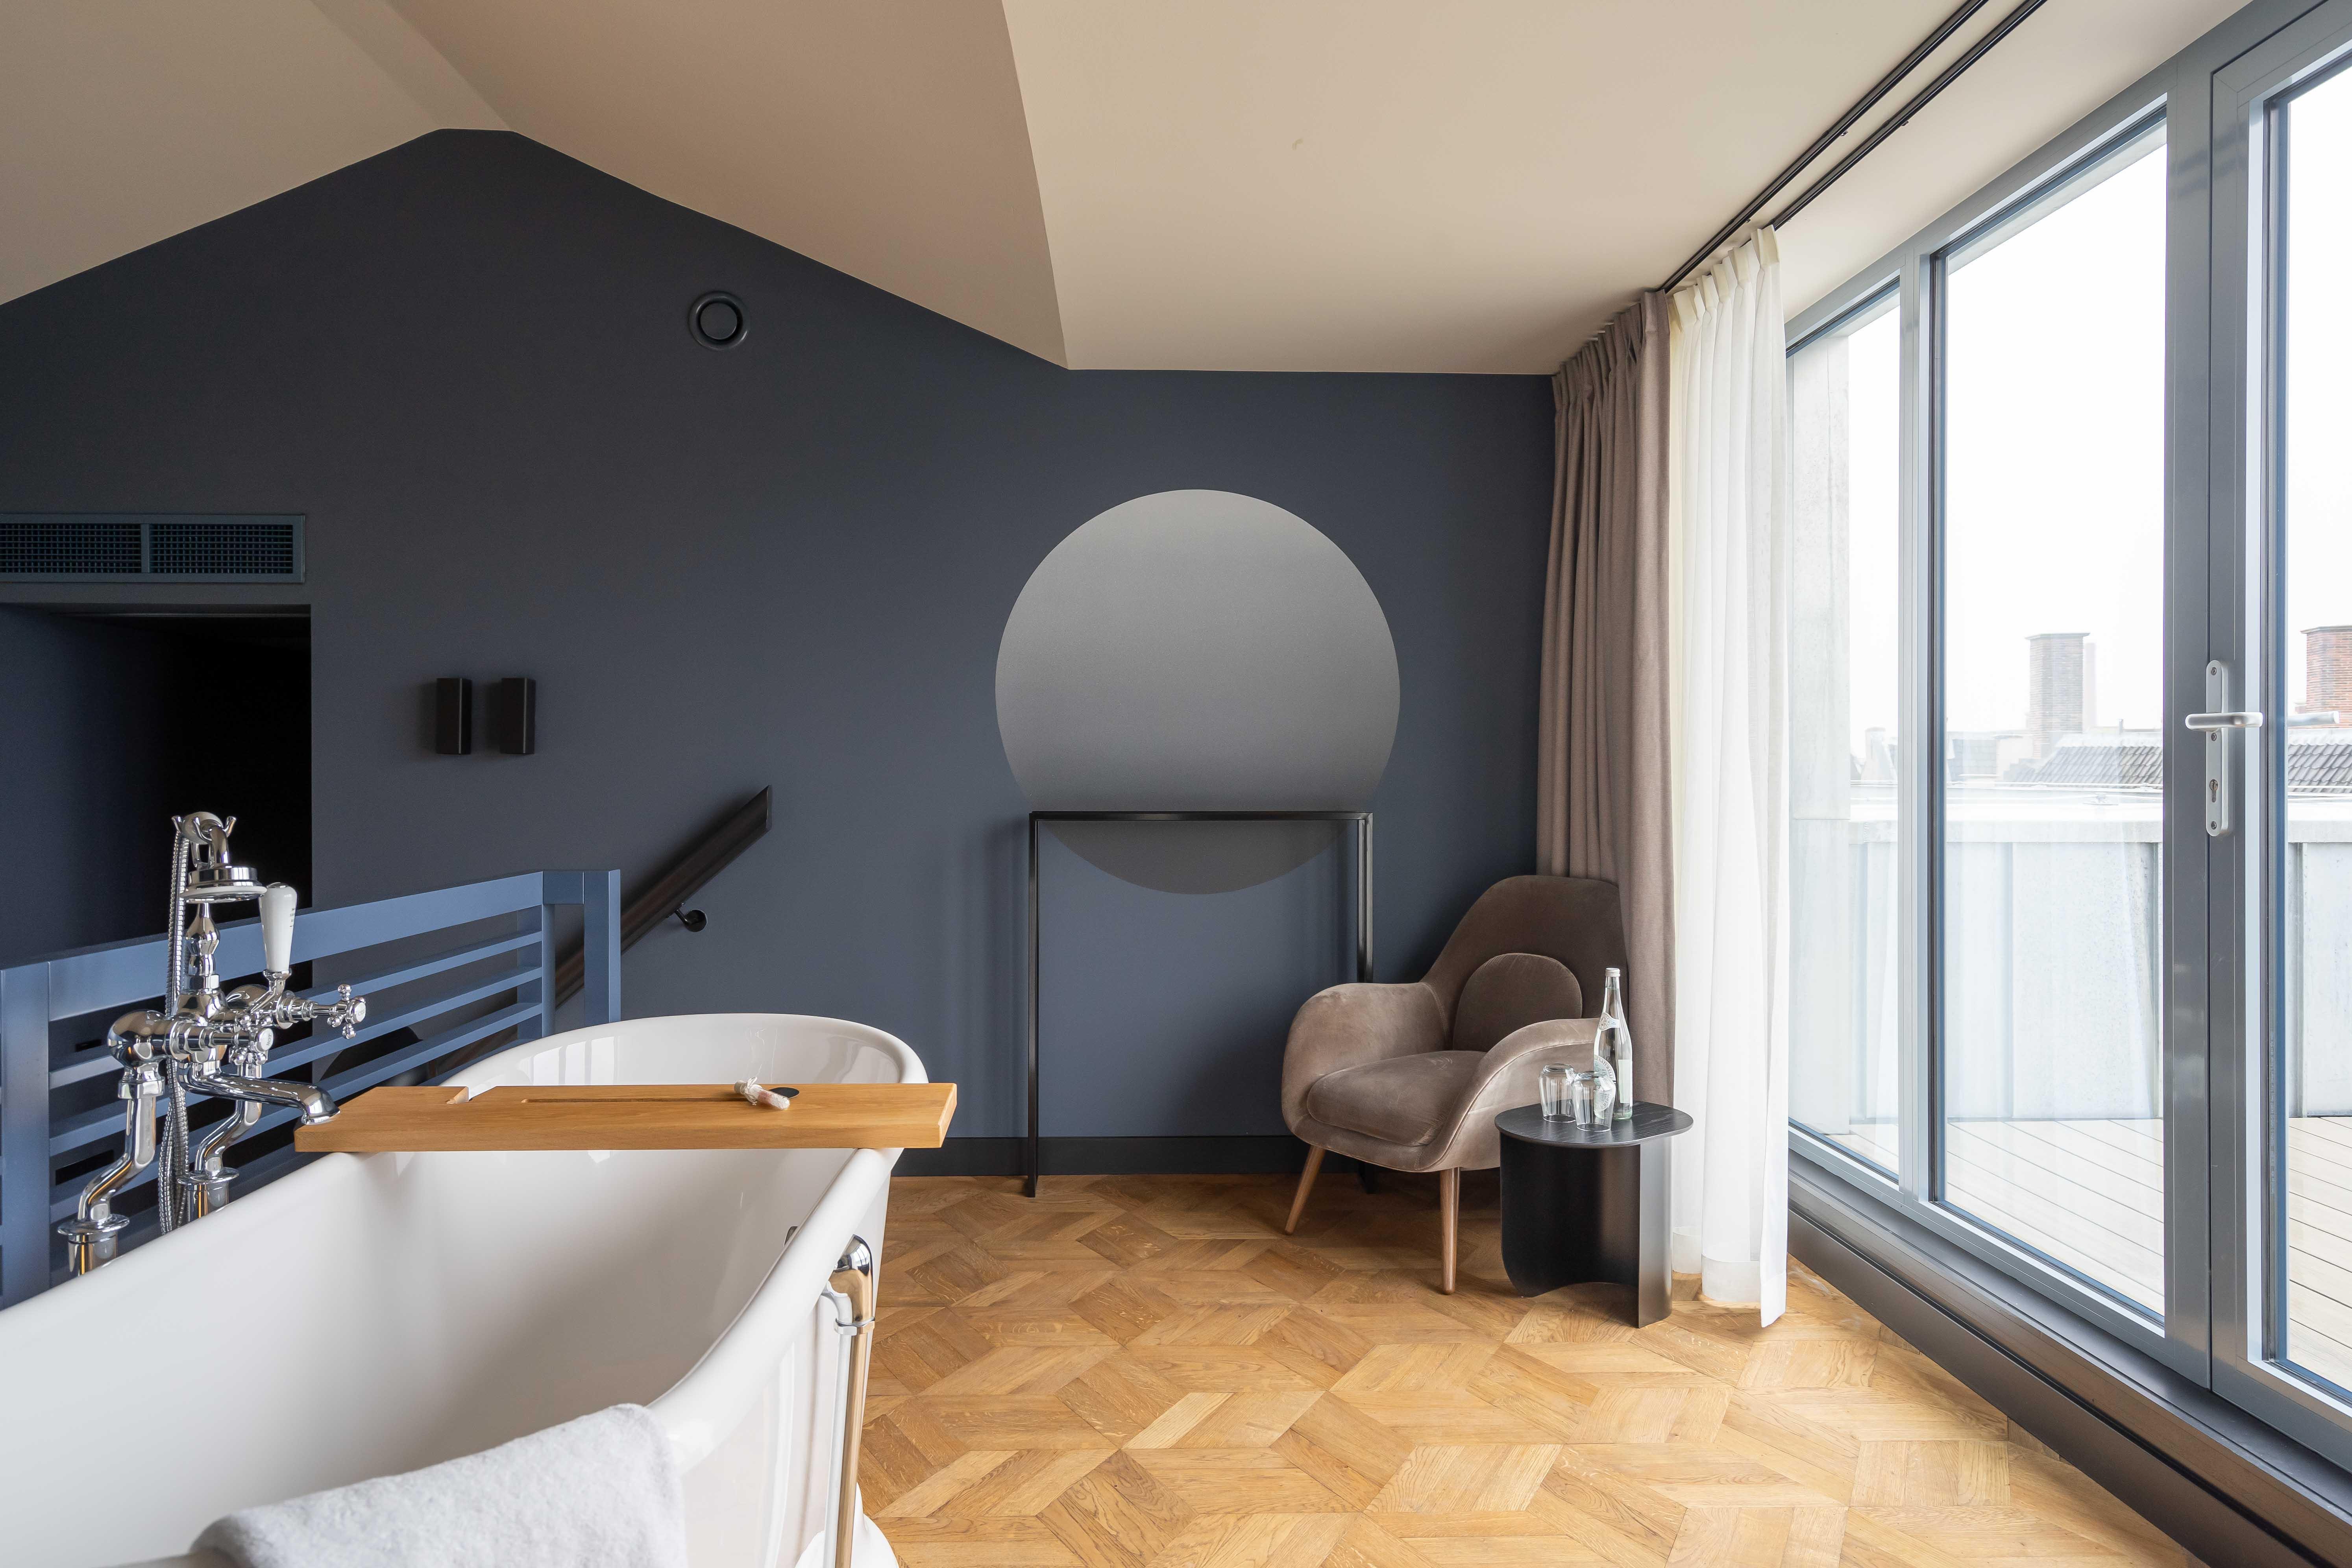 Hotel Interieur   The Nox Utrecht   Charlotte Kap Fotografie